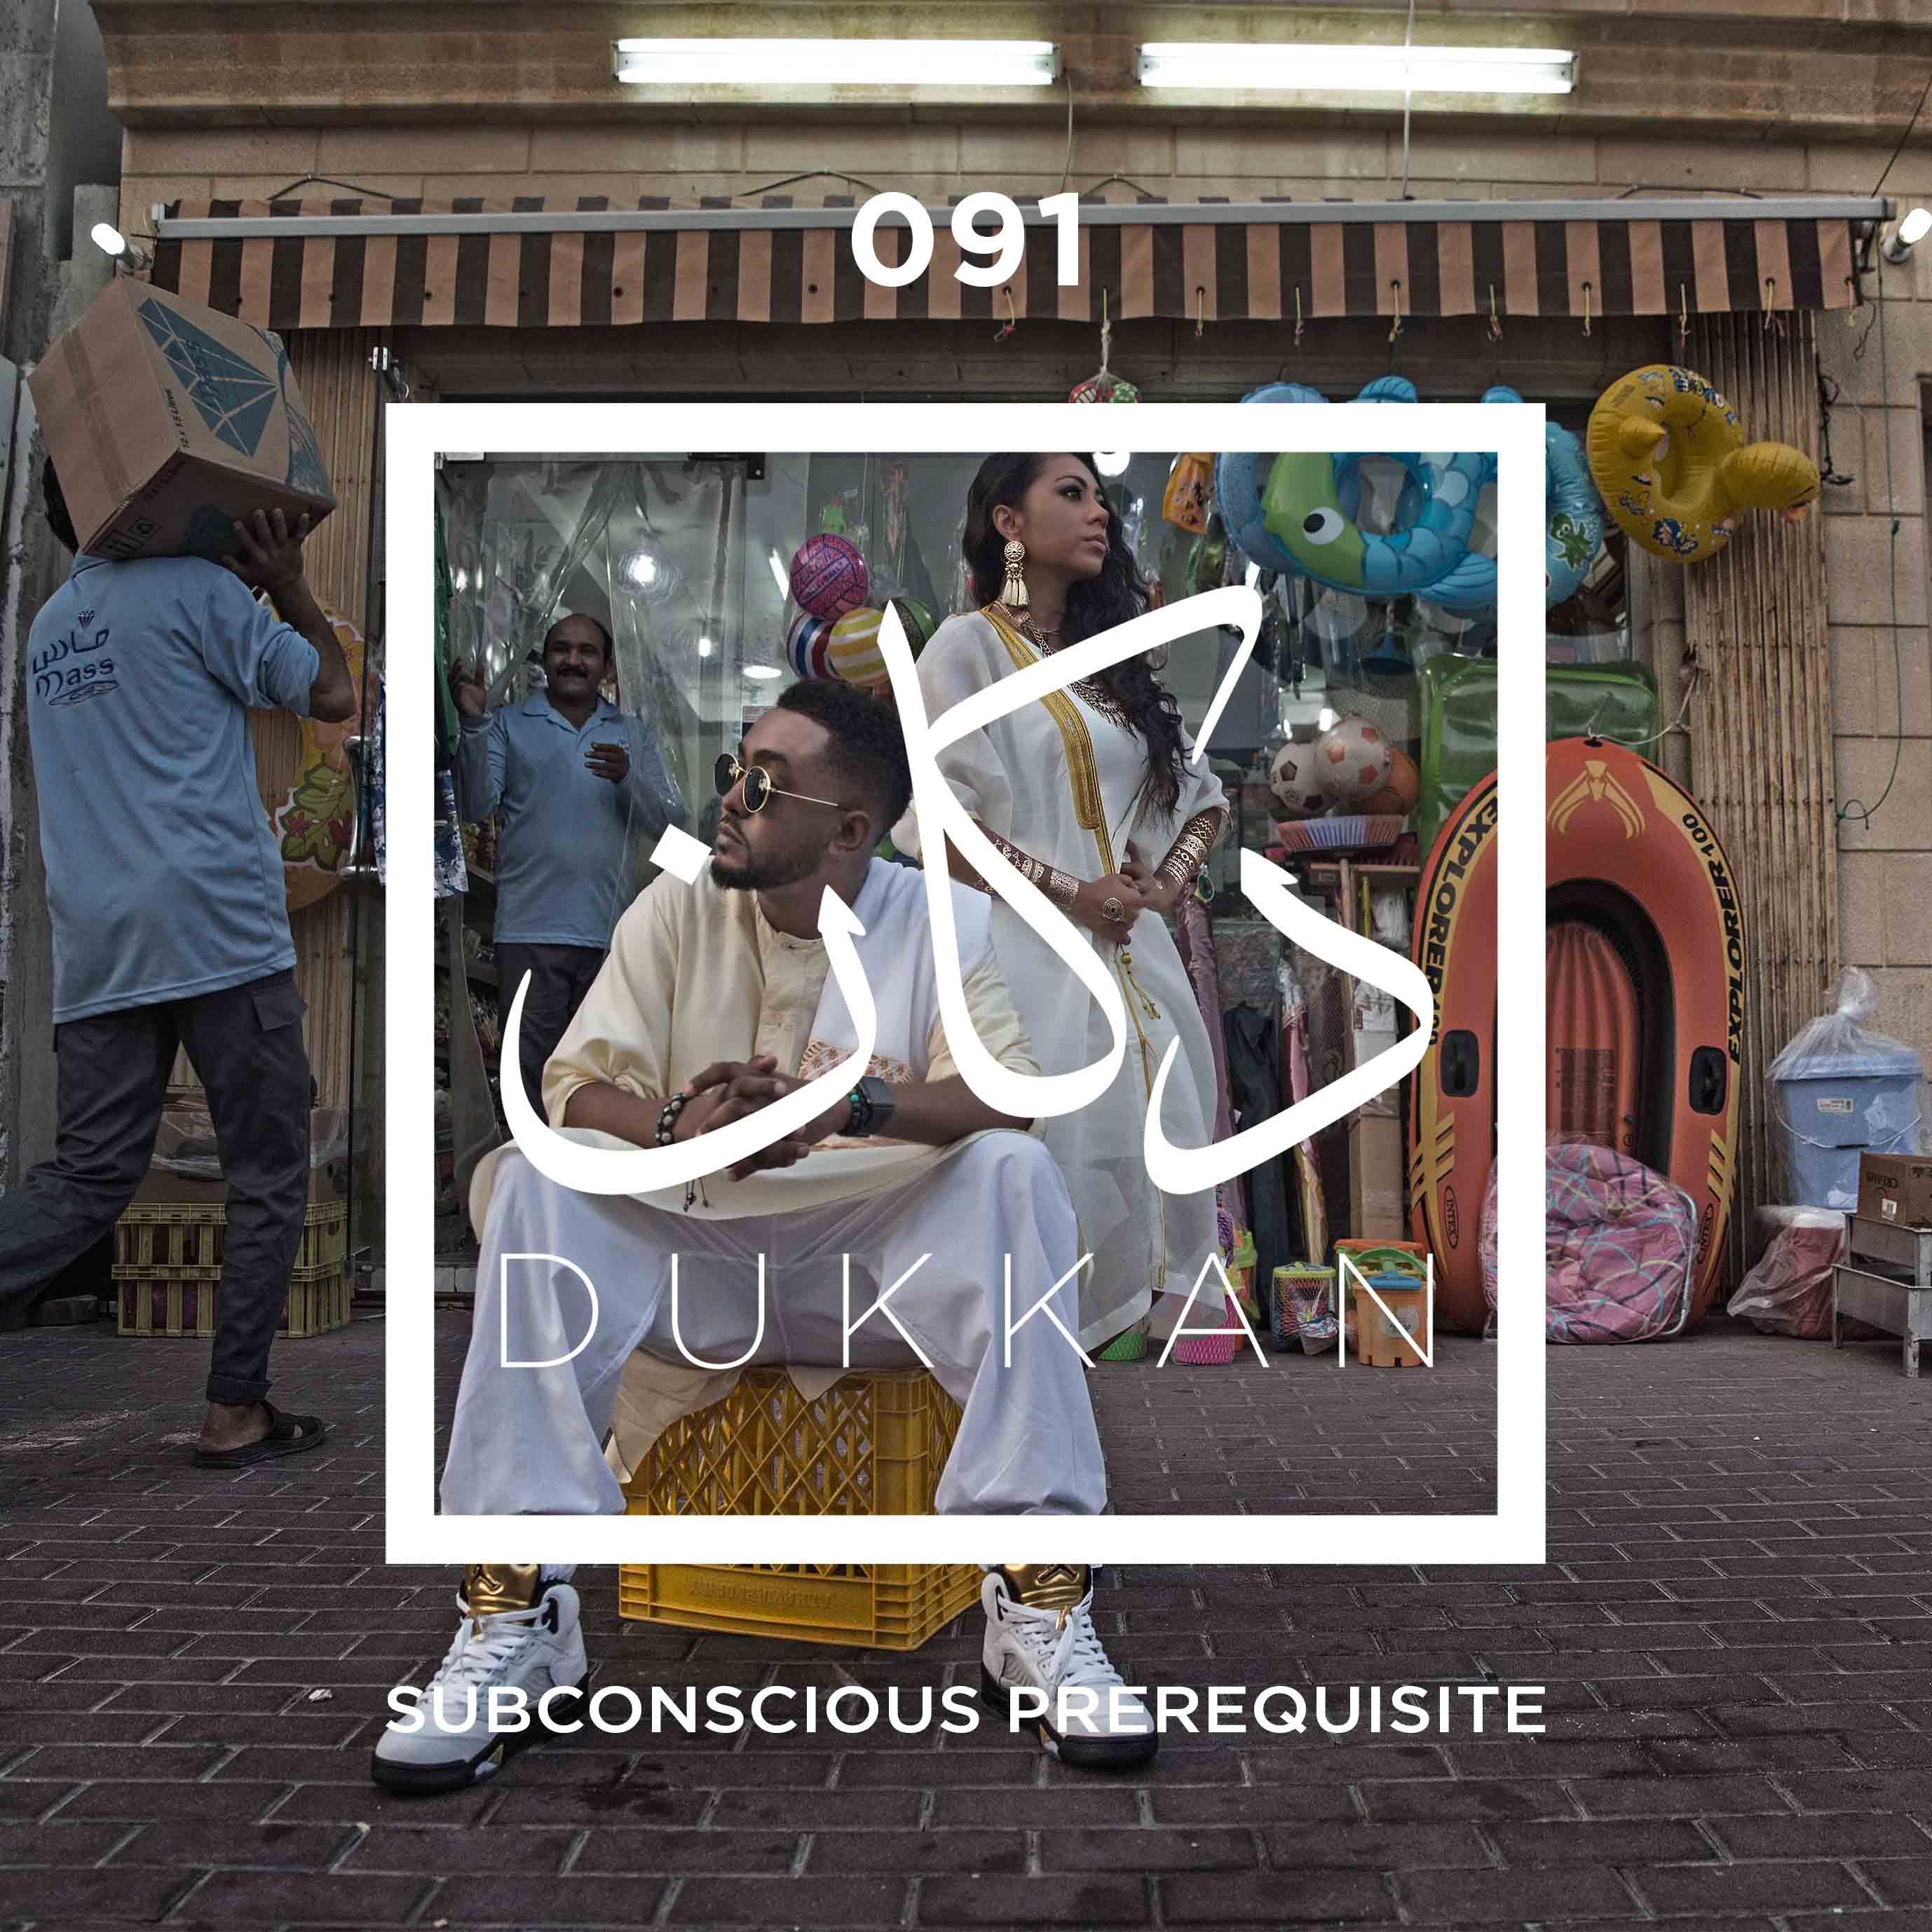 E091: Subconscious Prerequisite